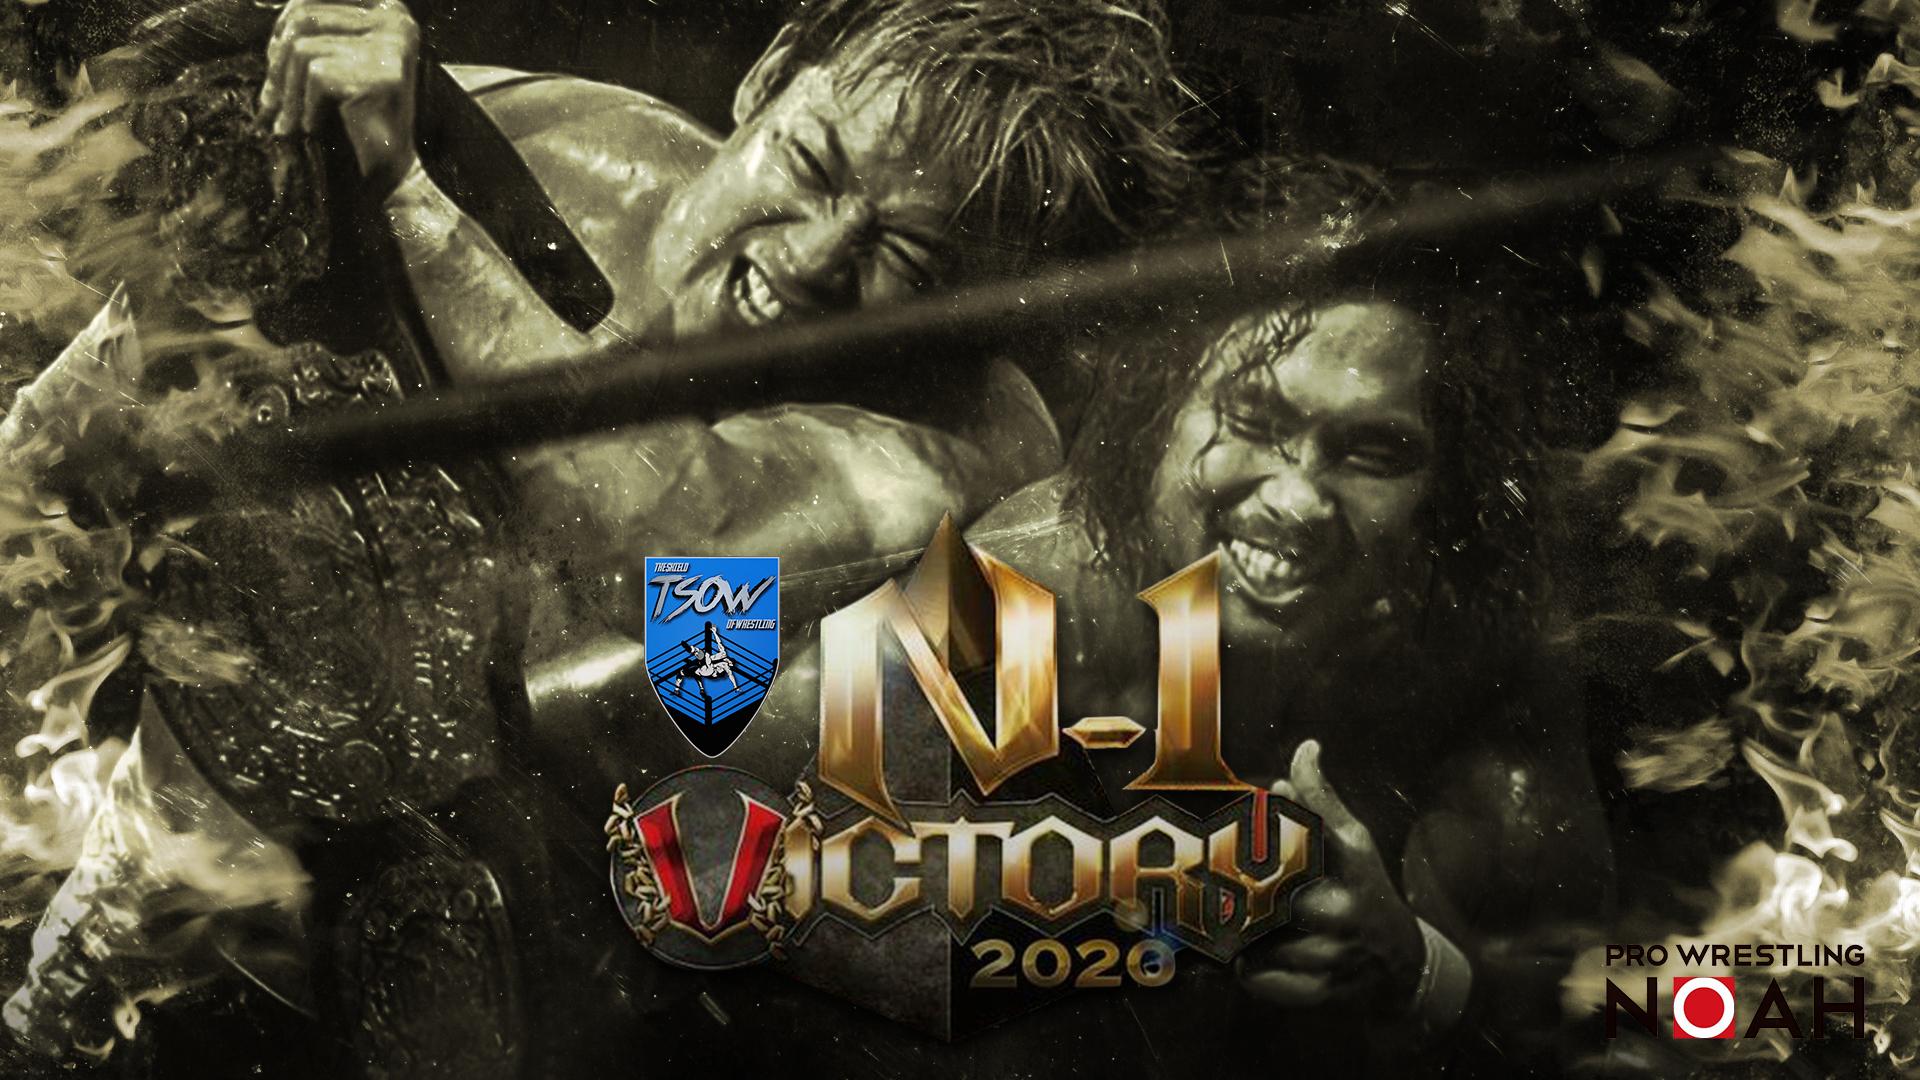 Risultati NOAH N-1 Victory 2020 – Day 7